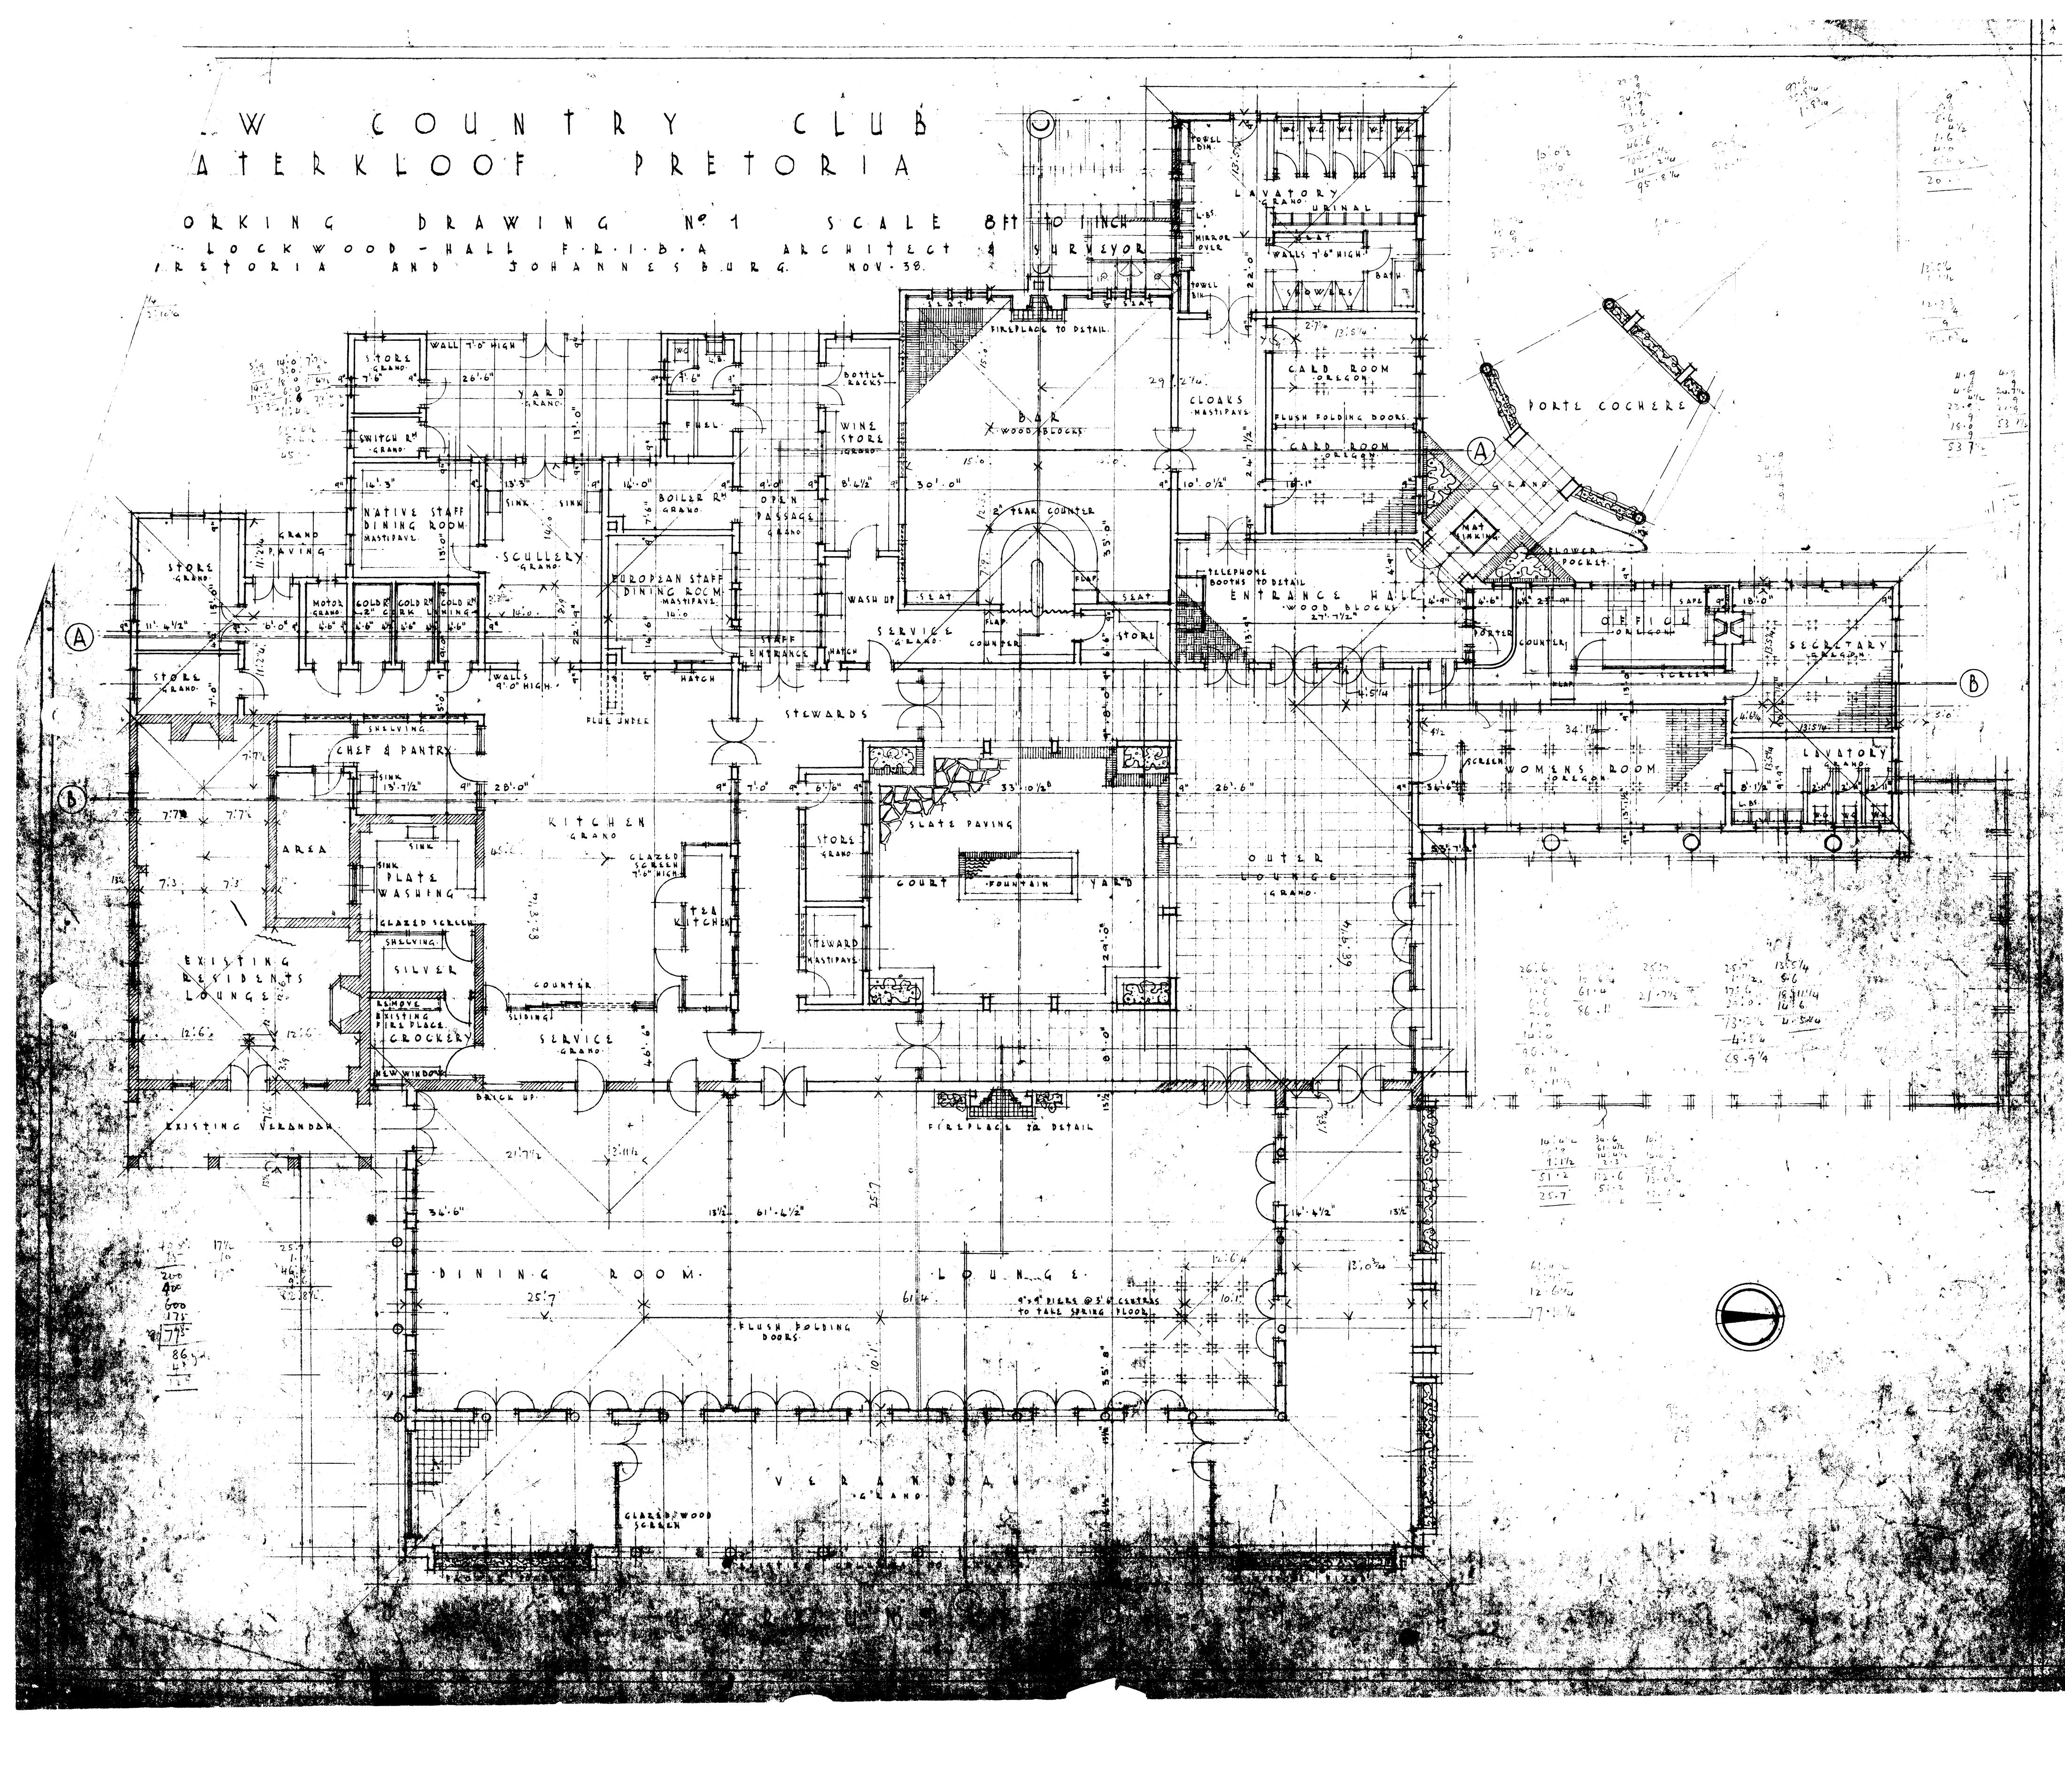 pretoria country club lockwood hall description ground floor plan